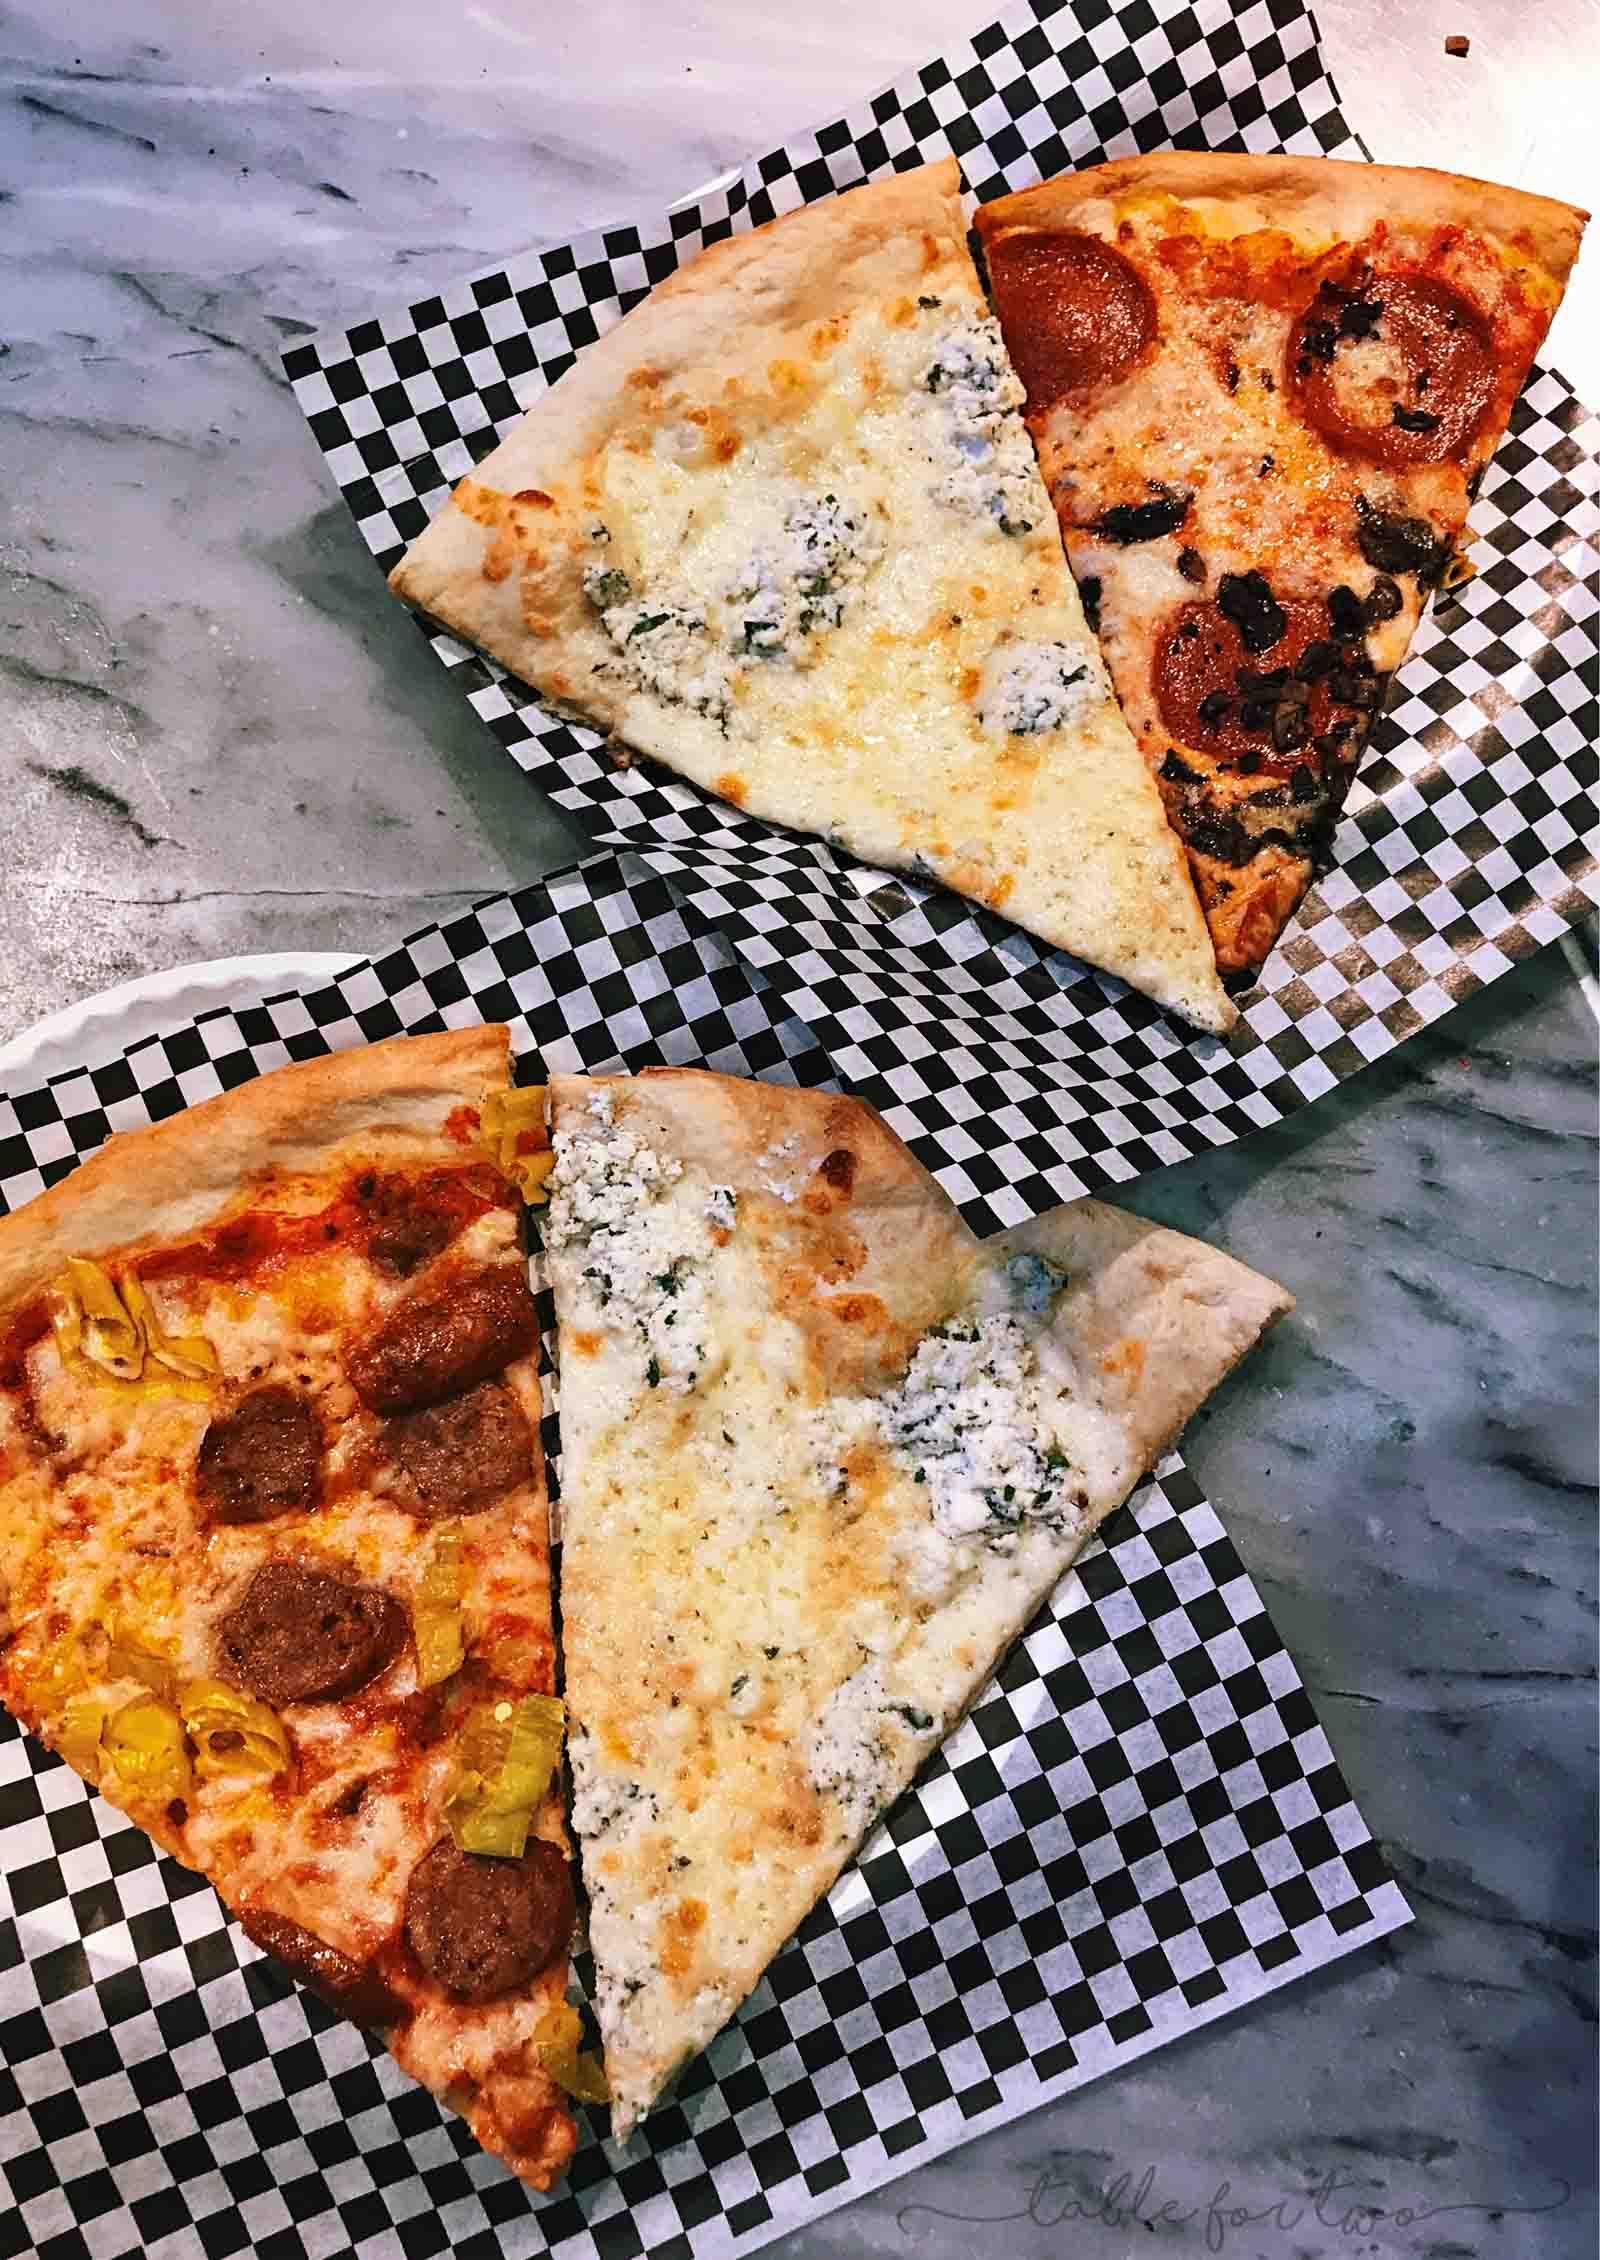 Secret pizzeria in The Cosmopolitan, Las Vegas, Nevada